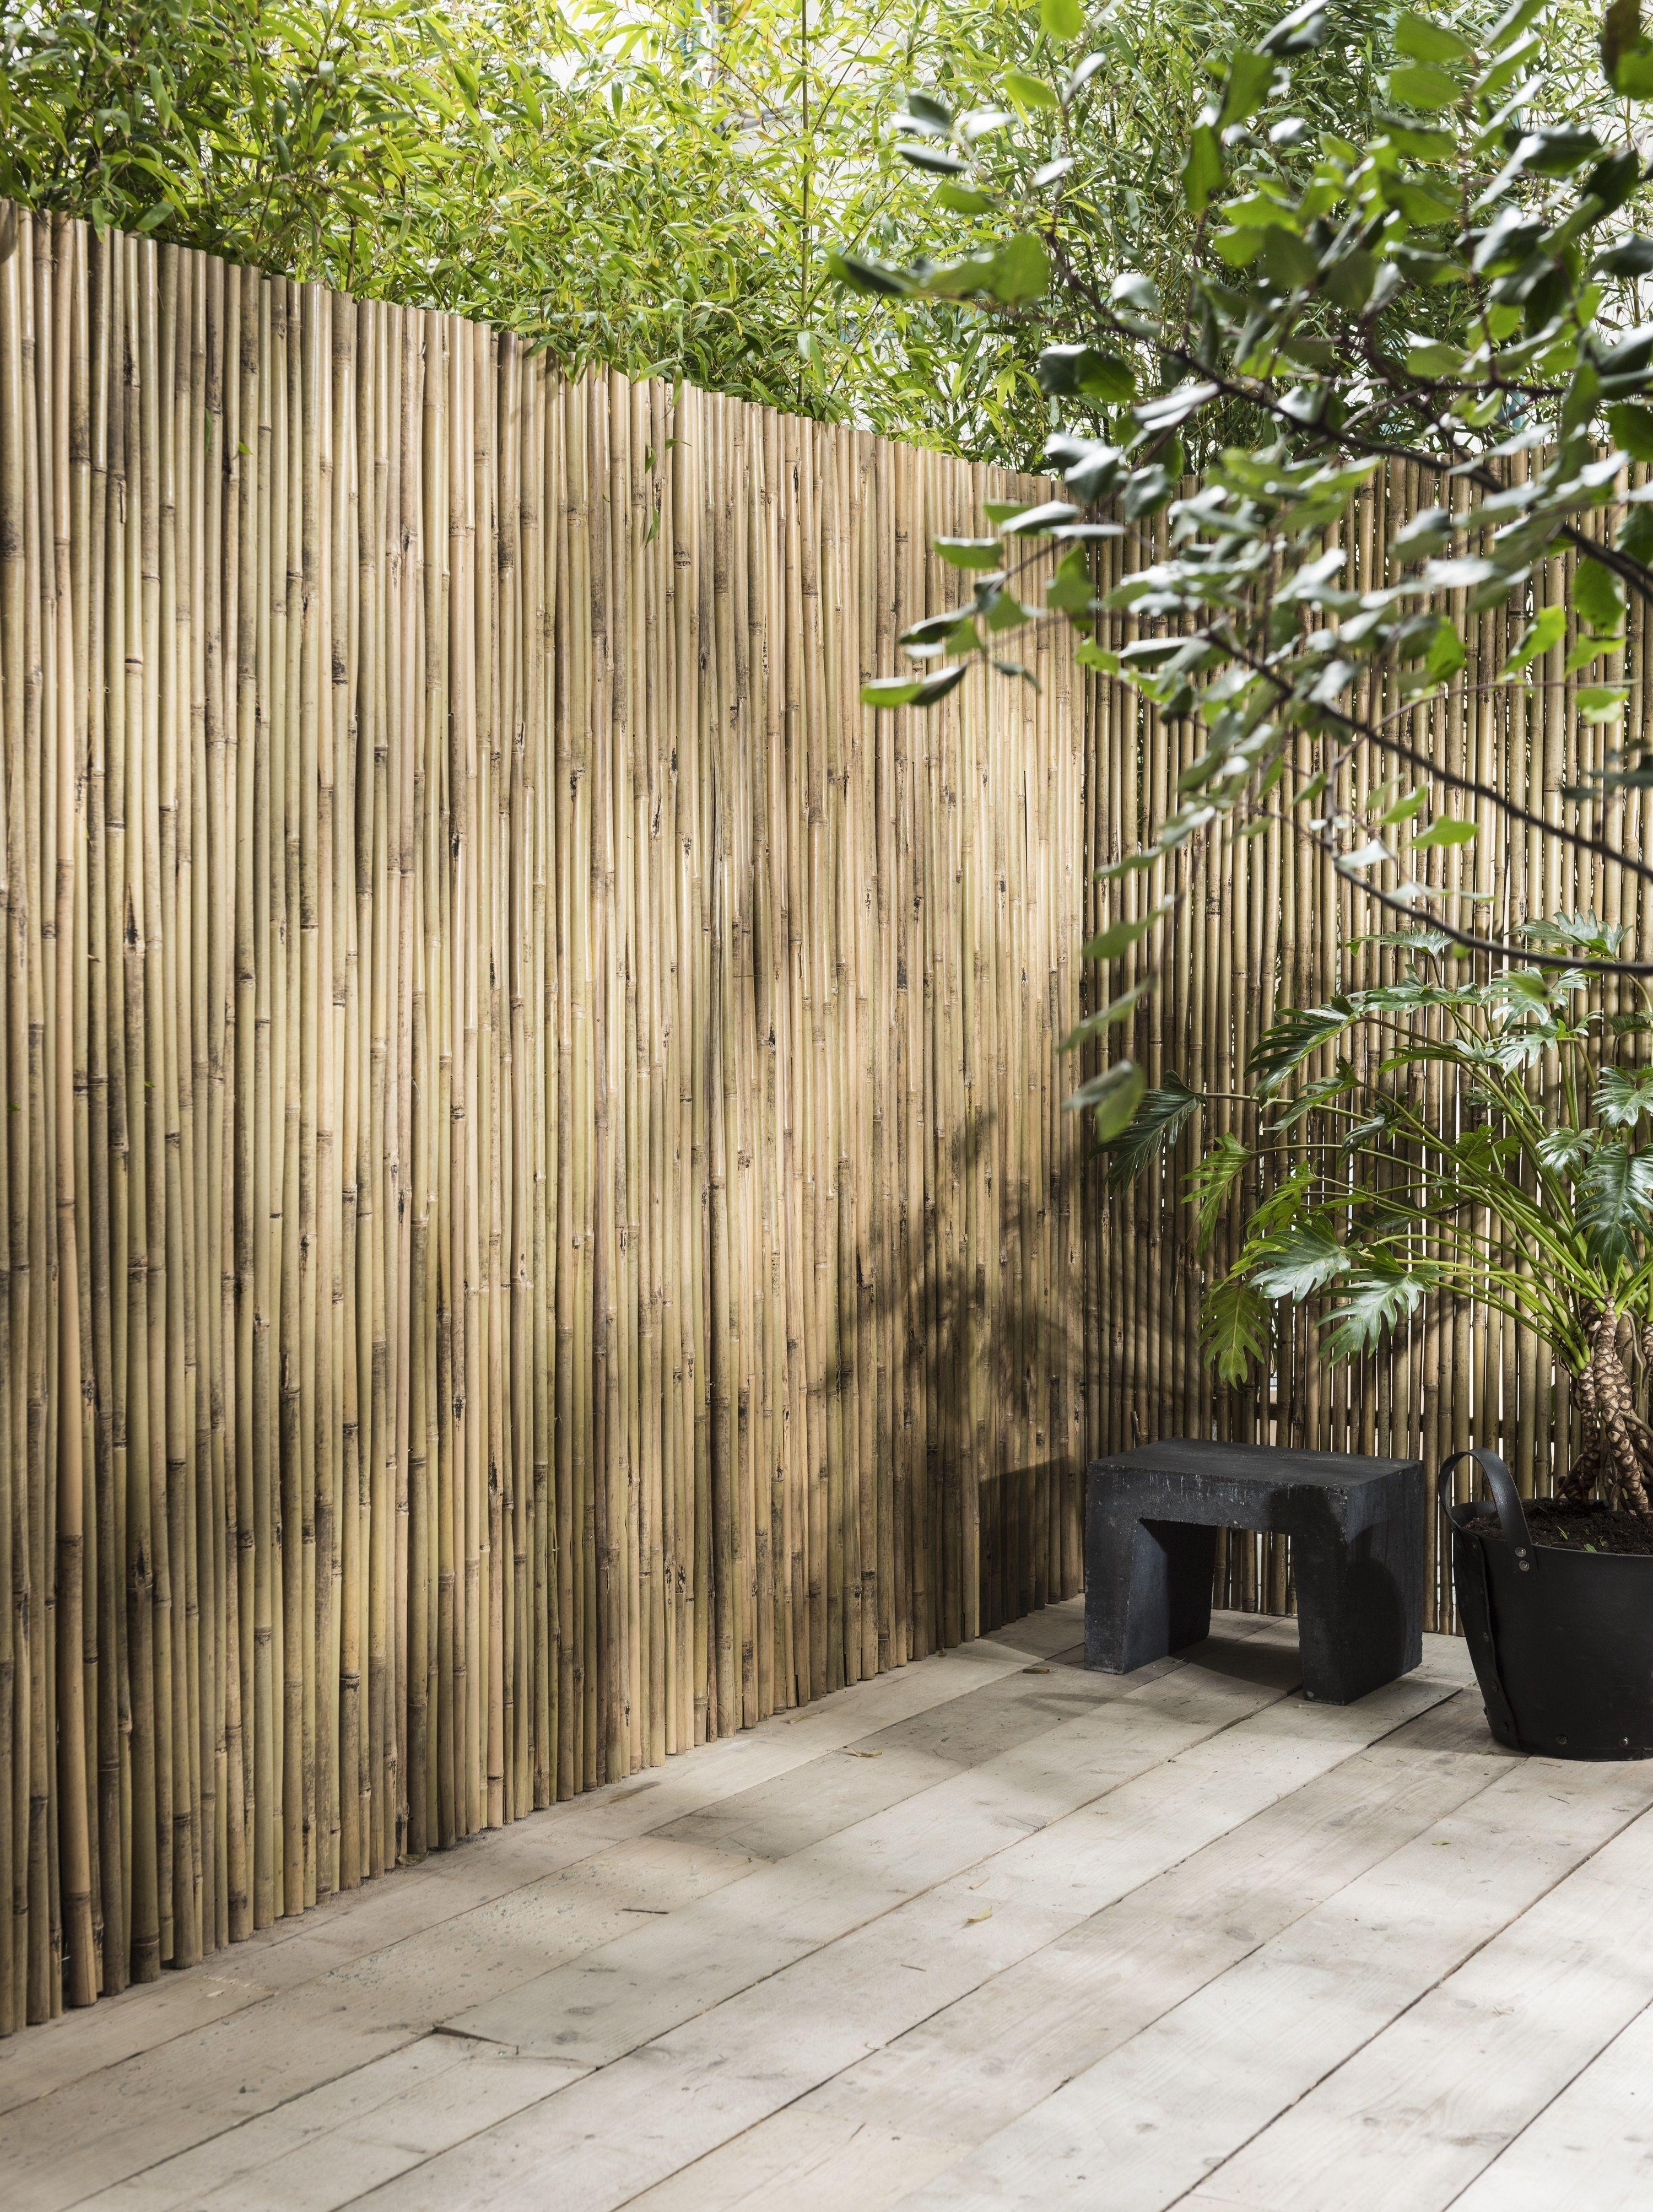 Bamboe Buitenwand Bamboo Outside Wall Karwei 3 2018